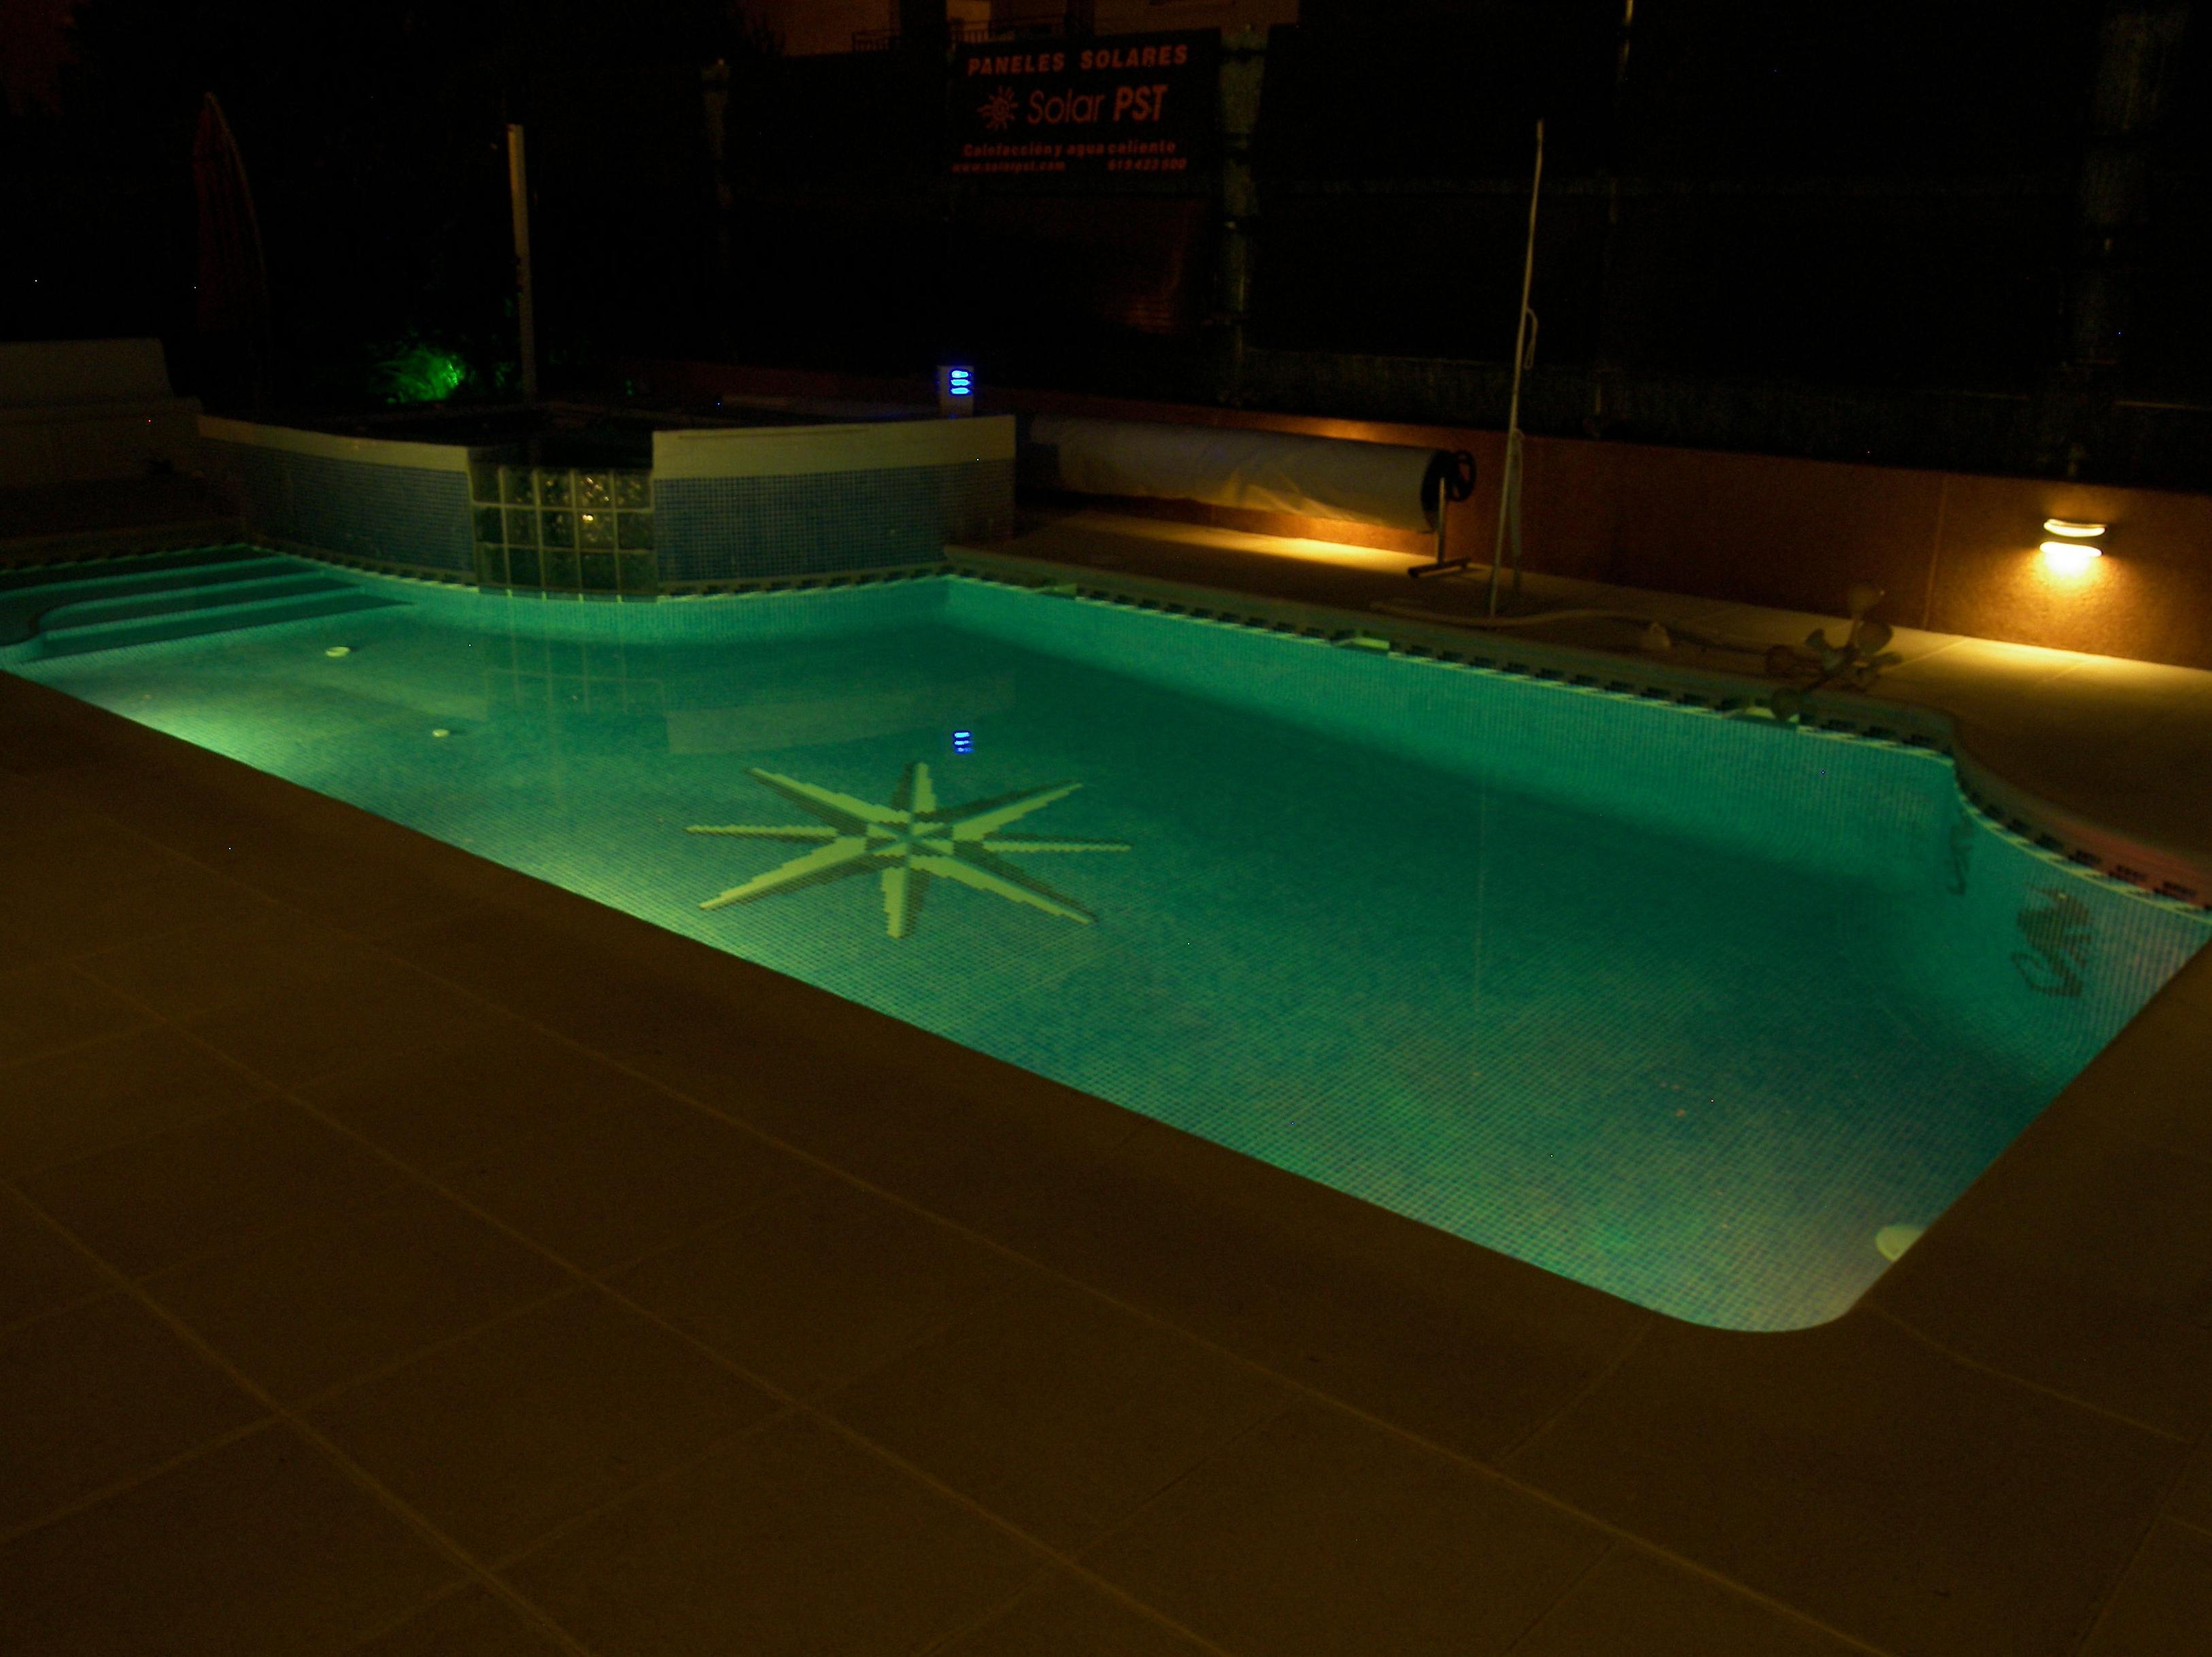 Focos led de color for Focos piscina led colores